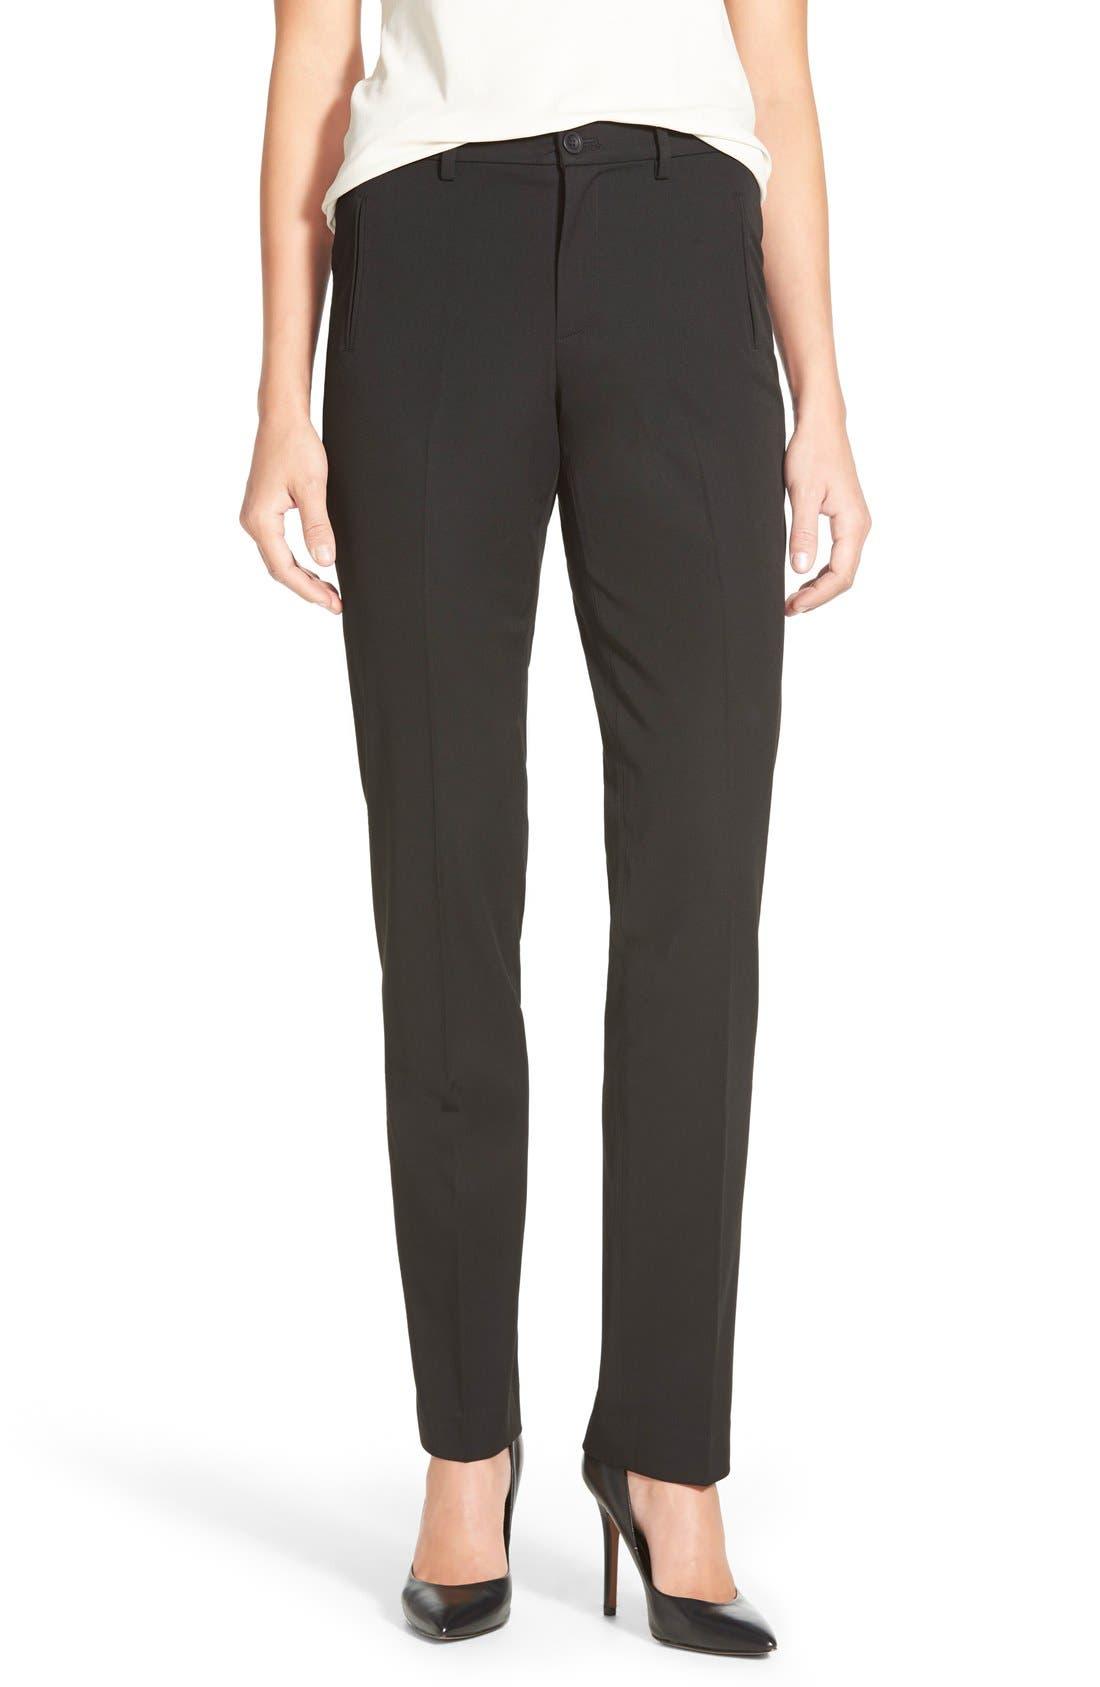 Alternate Image 1 Selected - NYDJ 'Sandrah' Stretch Slim Straight Leg Trousers (Regular & Petite)